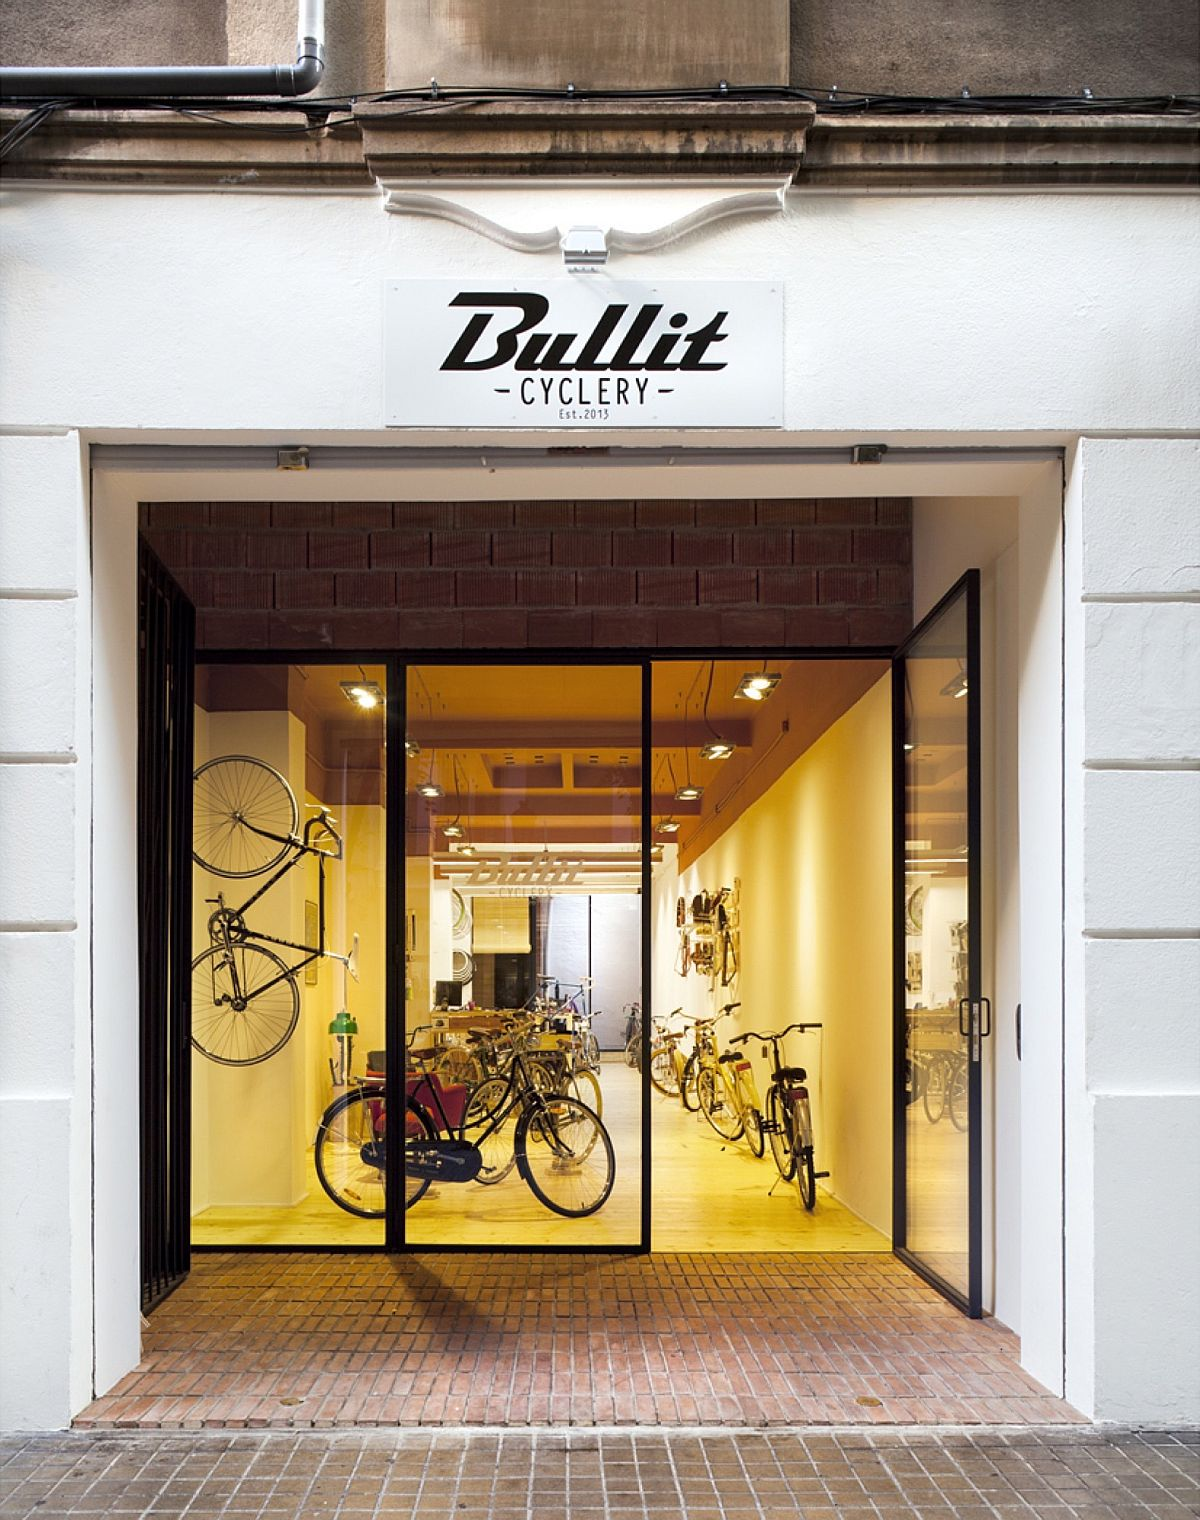 Bullit Cyclery in Valencia